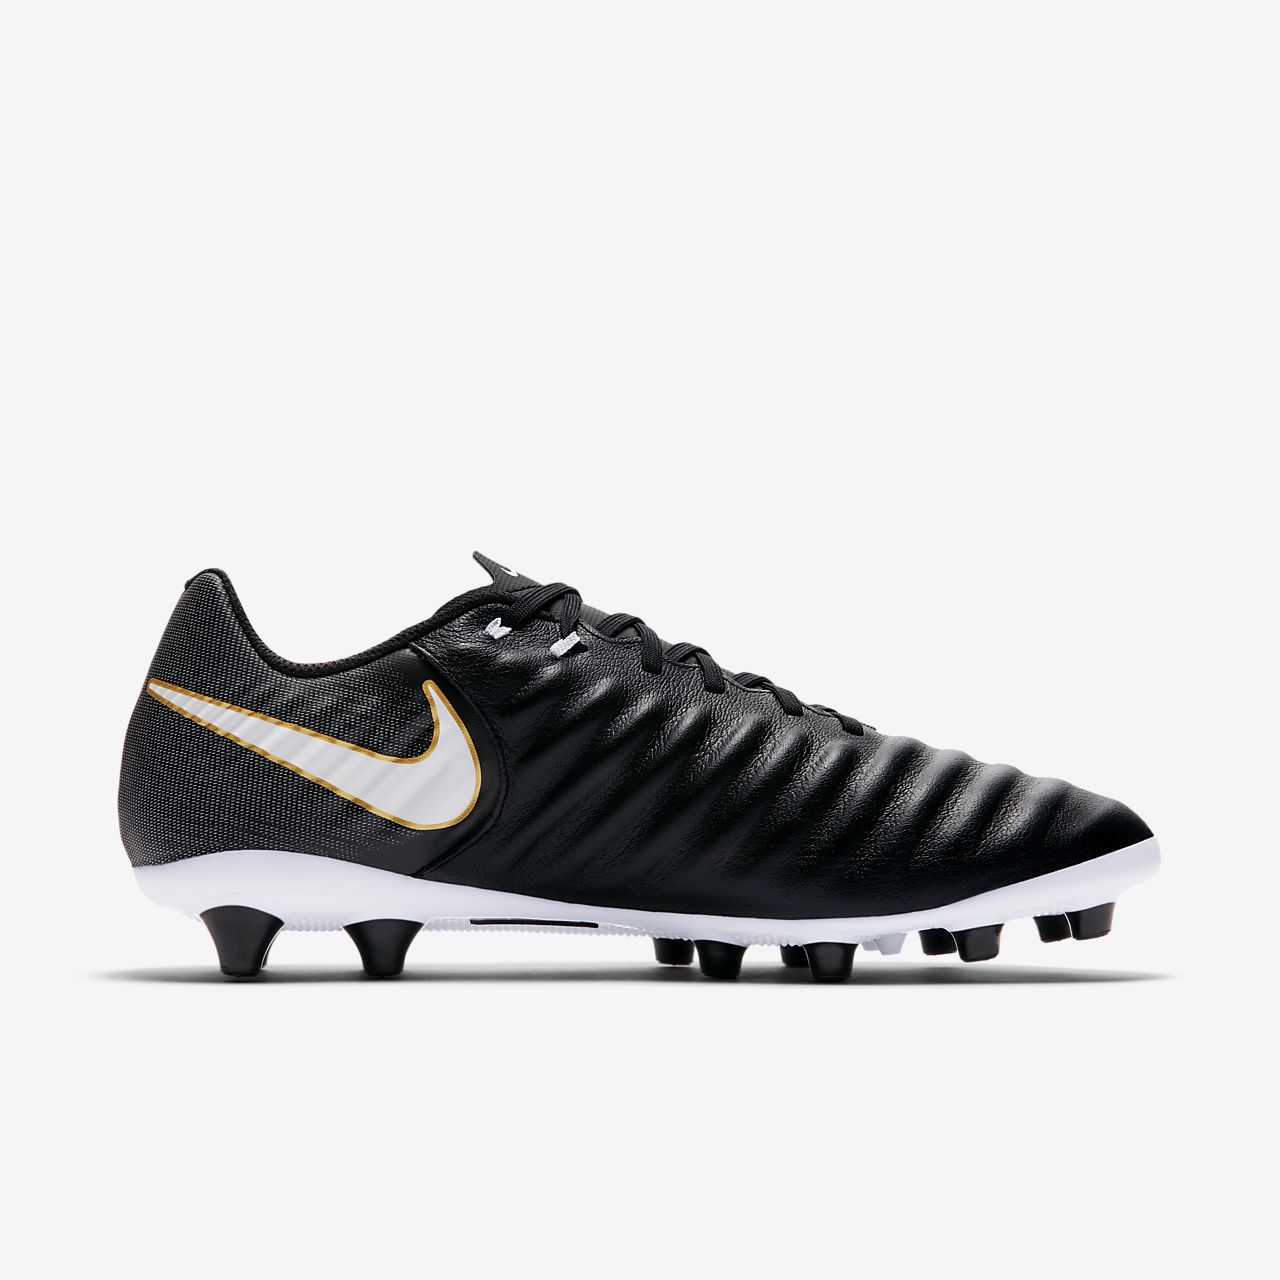 scarpa calcio nike tiempo ag